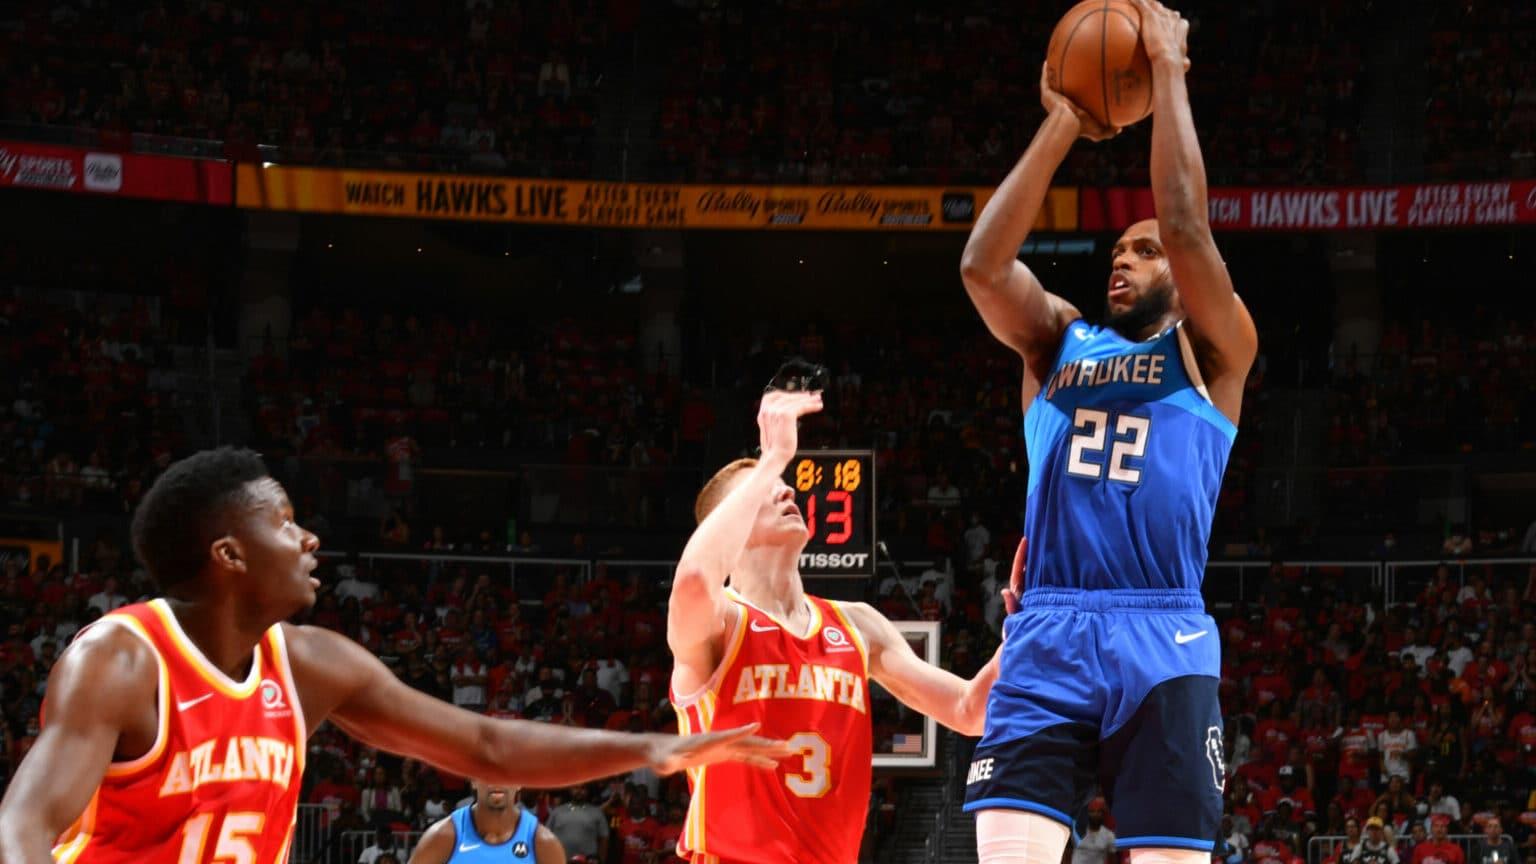 In Game 3, Khris Middleton's fiery 4th quarter boosts Bucks beyond Hawks' reach